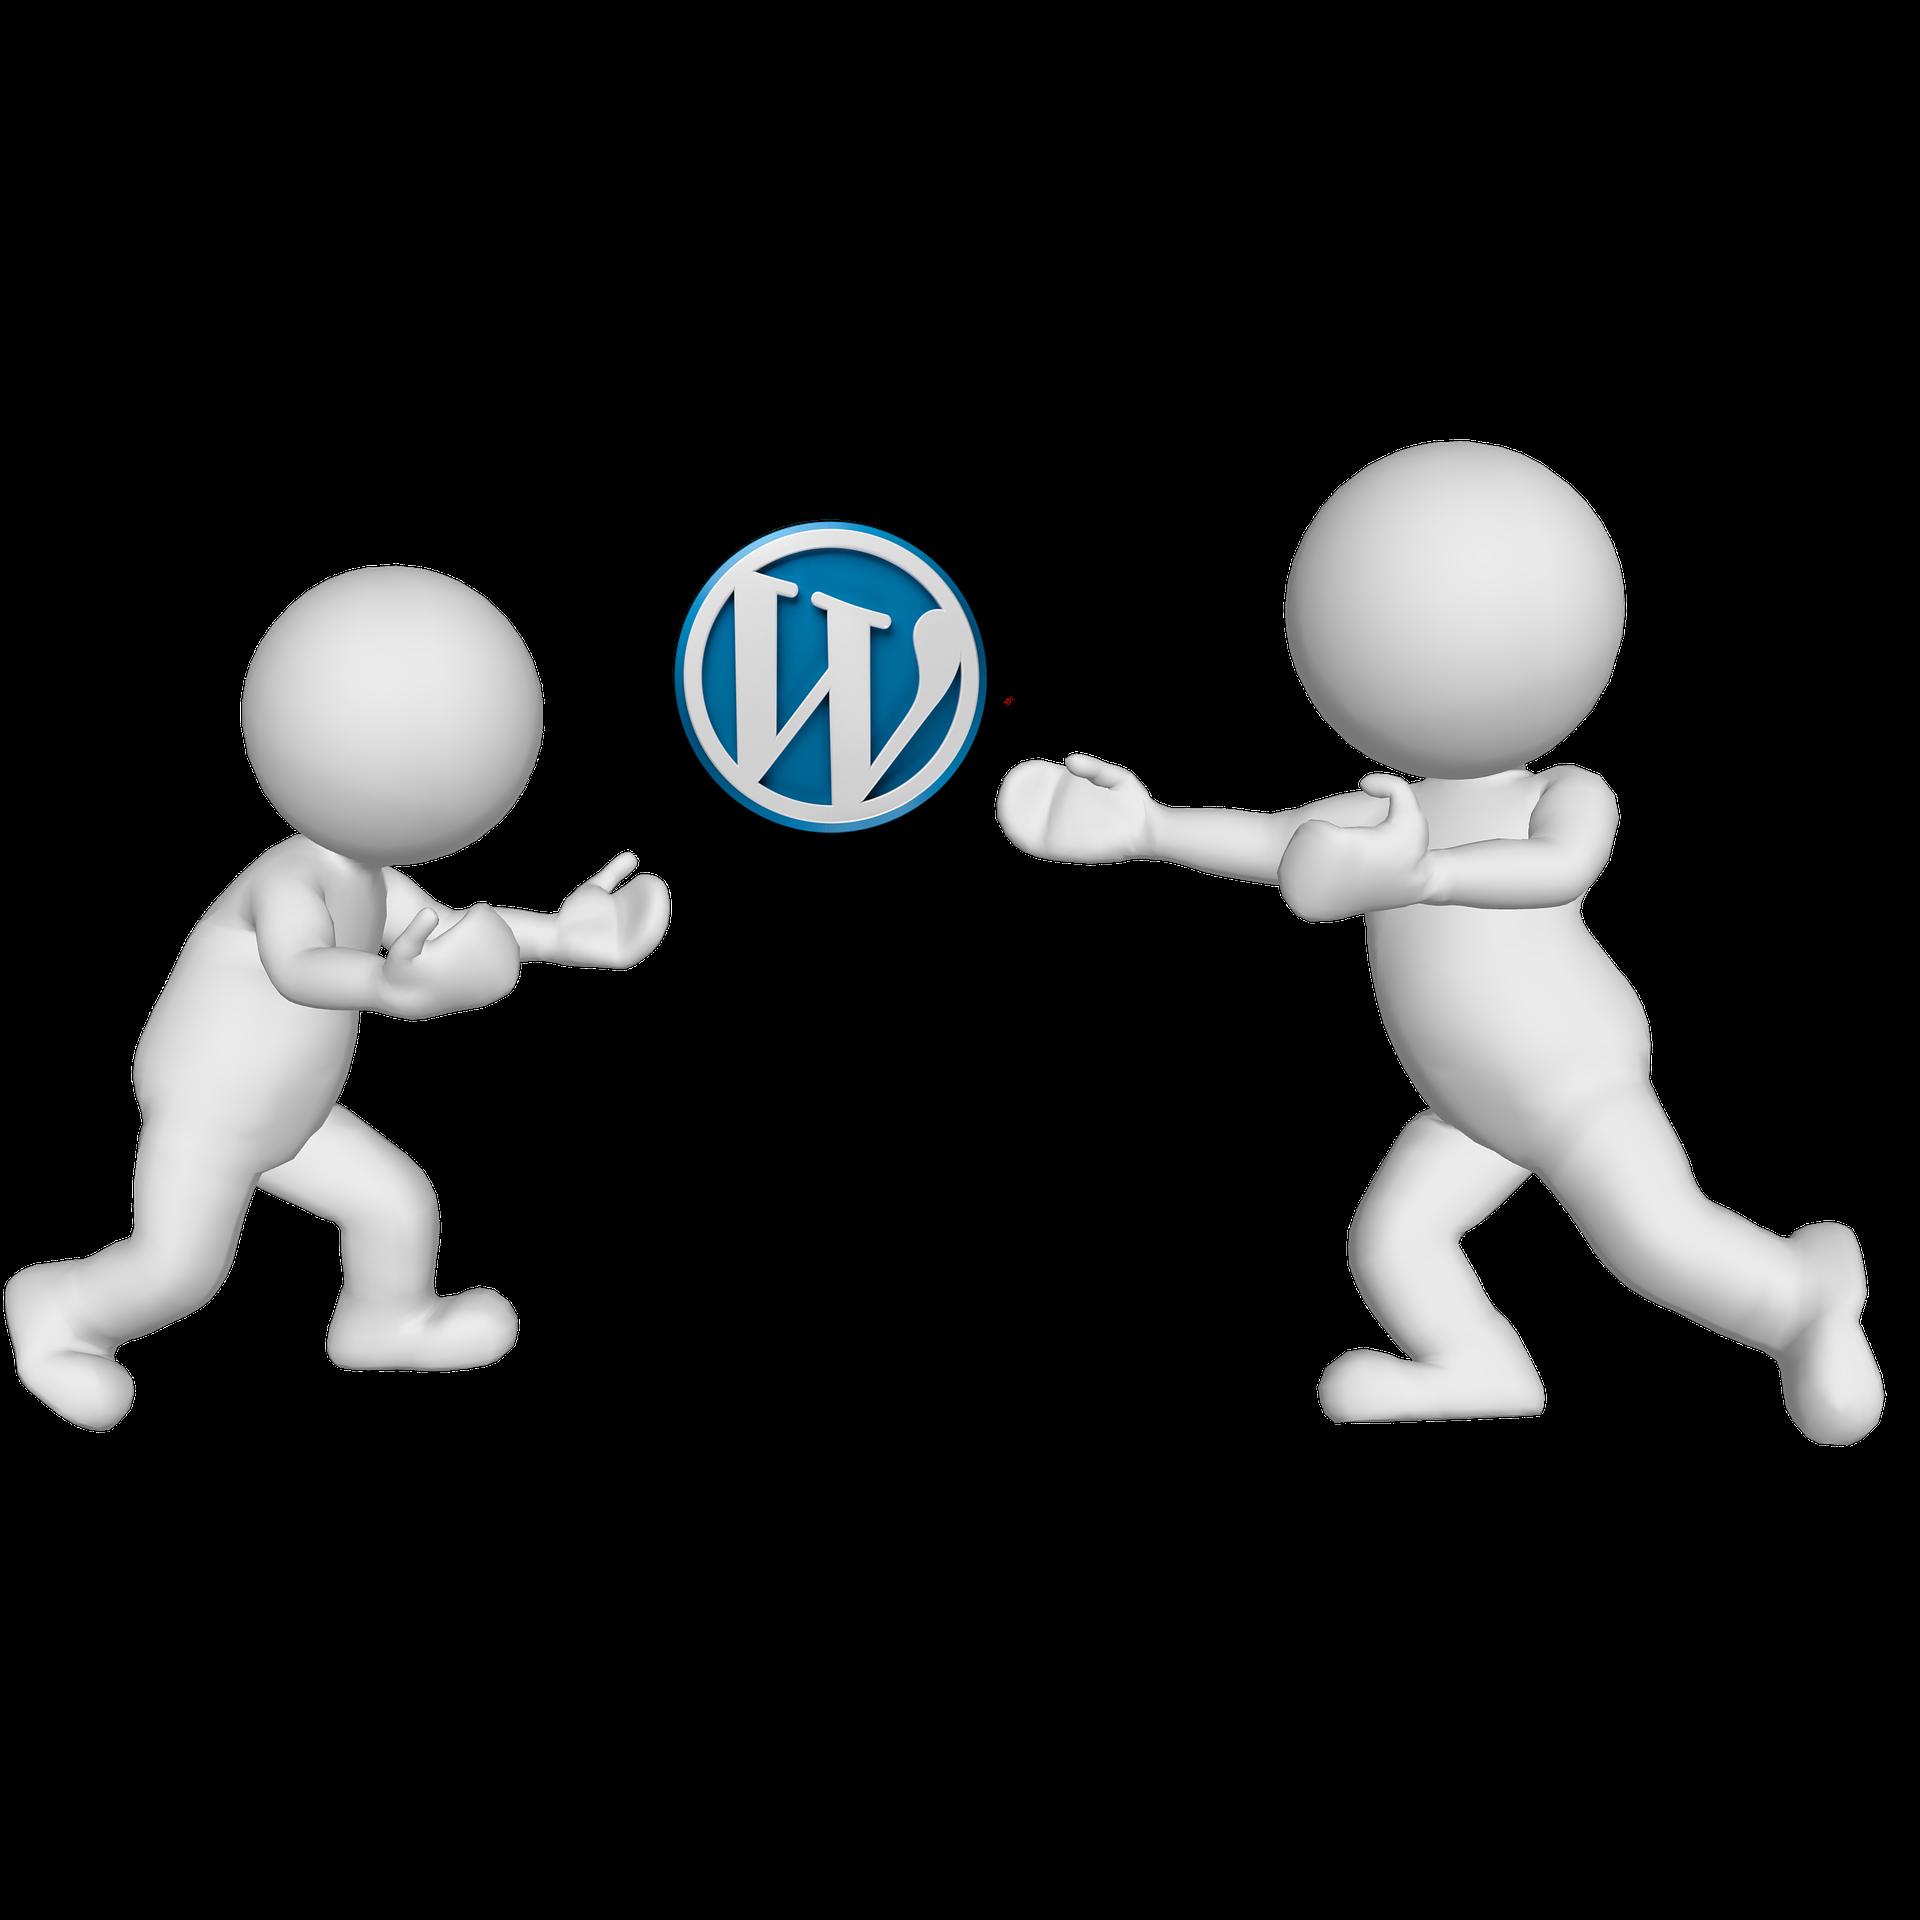 Wordpress logo between two white dudes